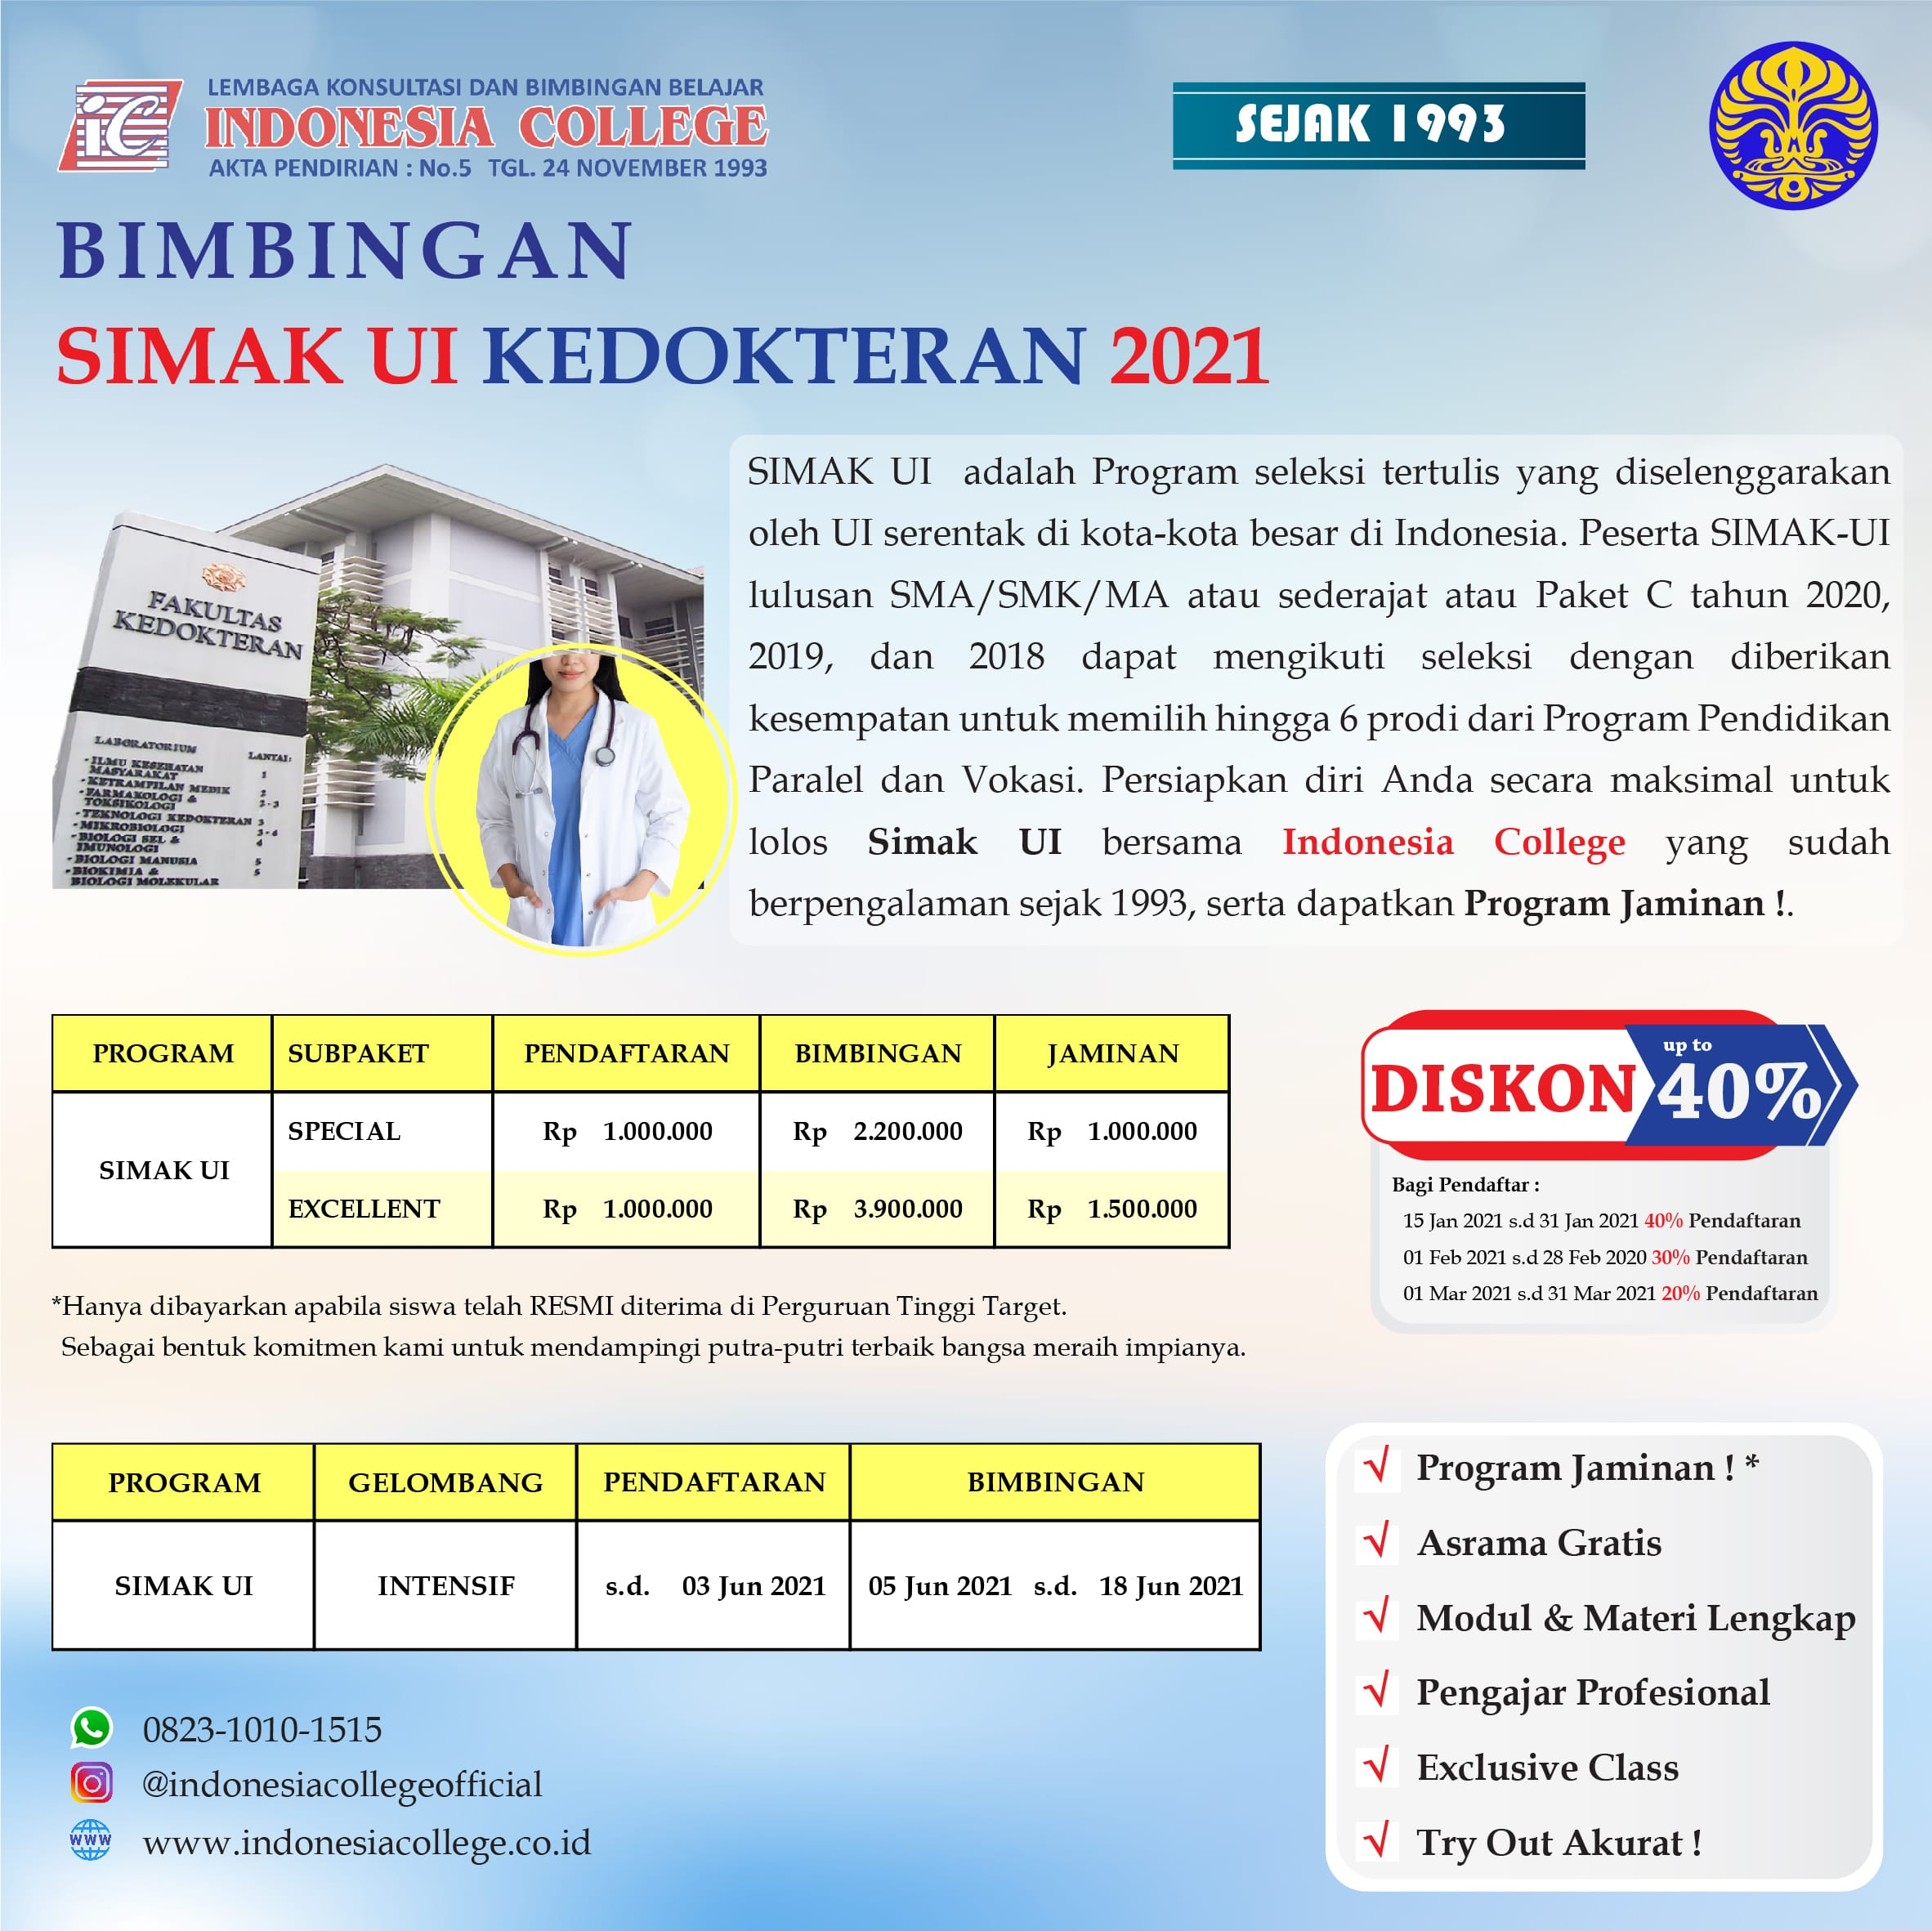 BIMBEL SIMAK UI 2021 (HARGA) PART-03-min